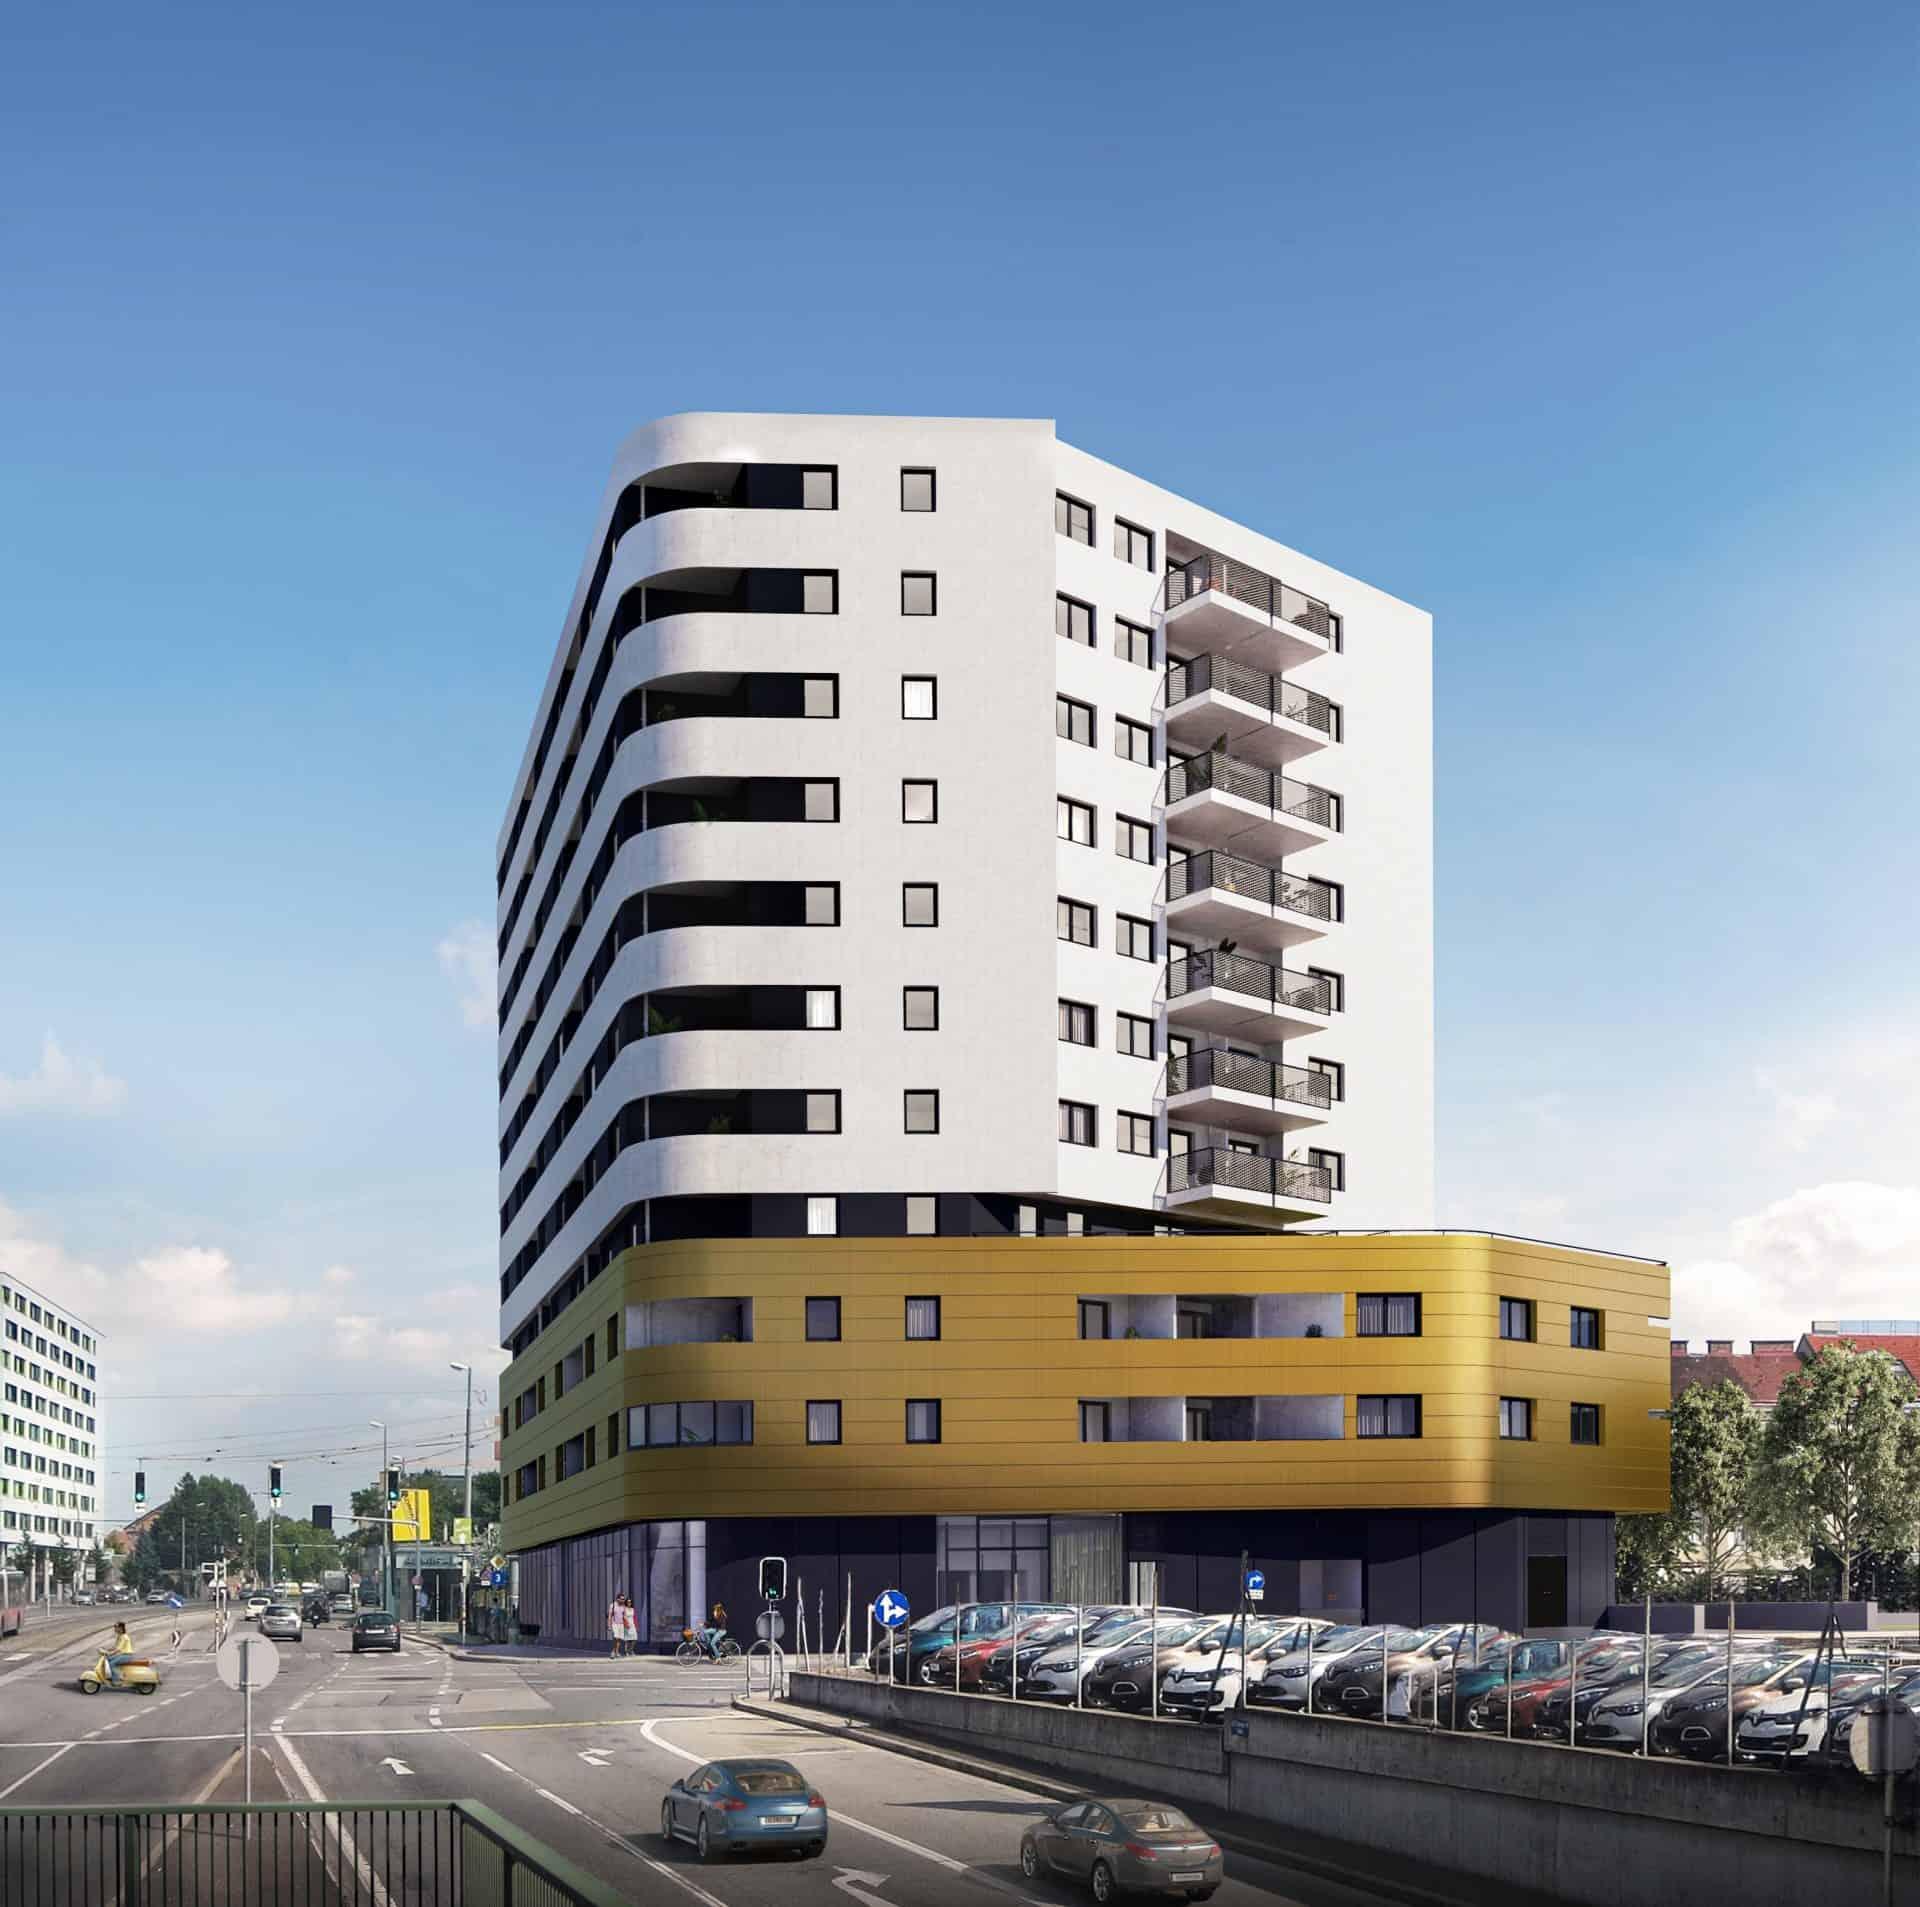 Wohnungen am Genochplatz in Wien - C&P Immobilien AG